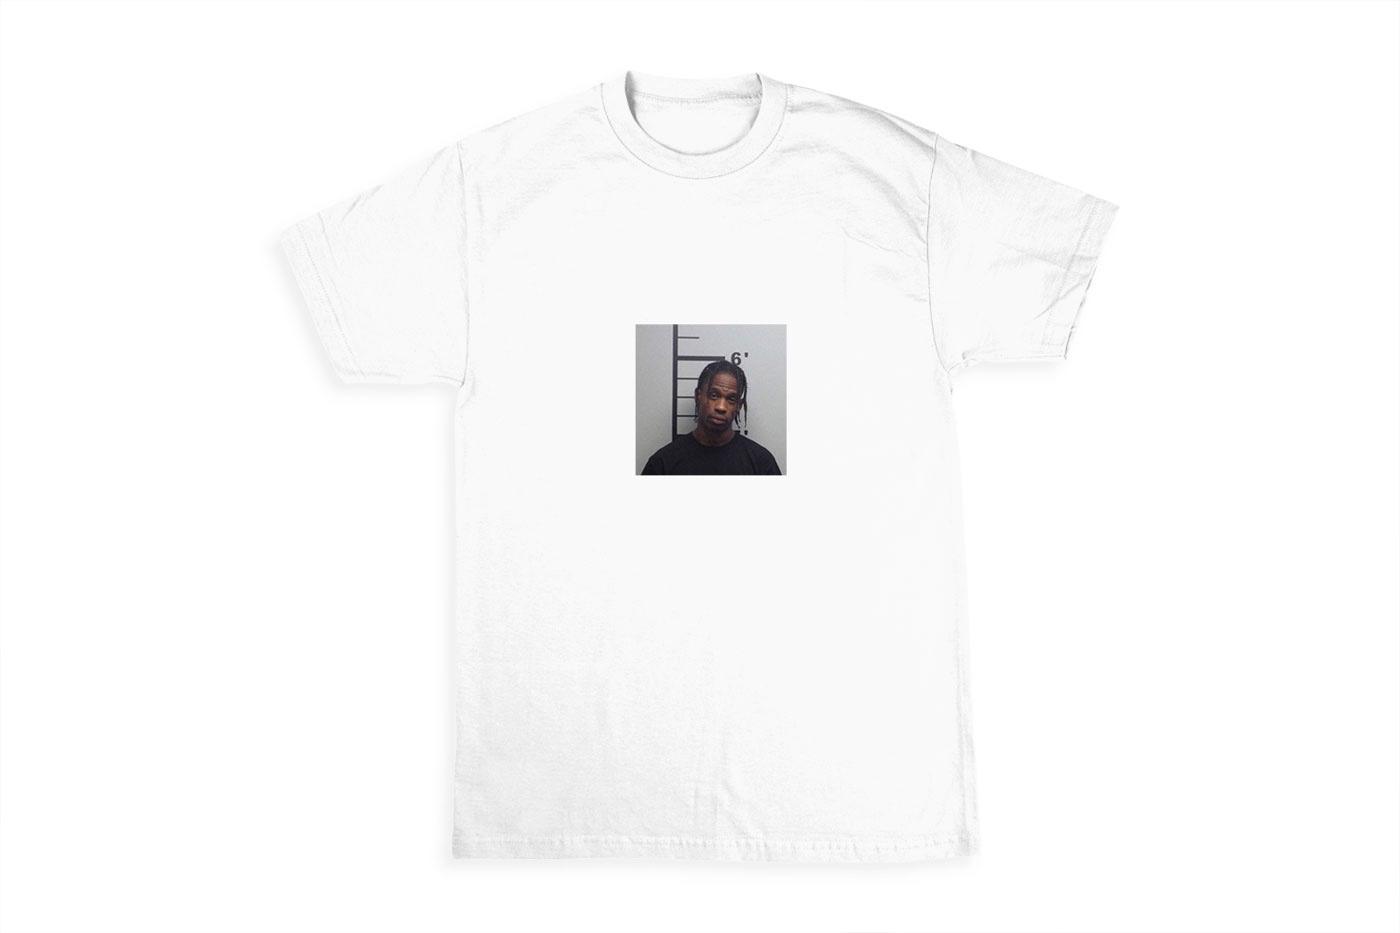 Travis Scott Releases Limited Edition Mugshot T-Shirt